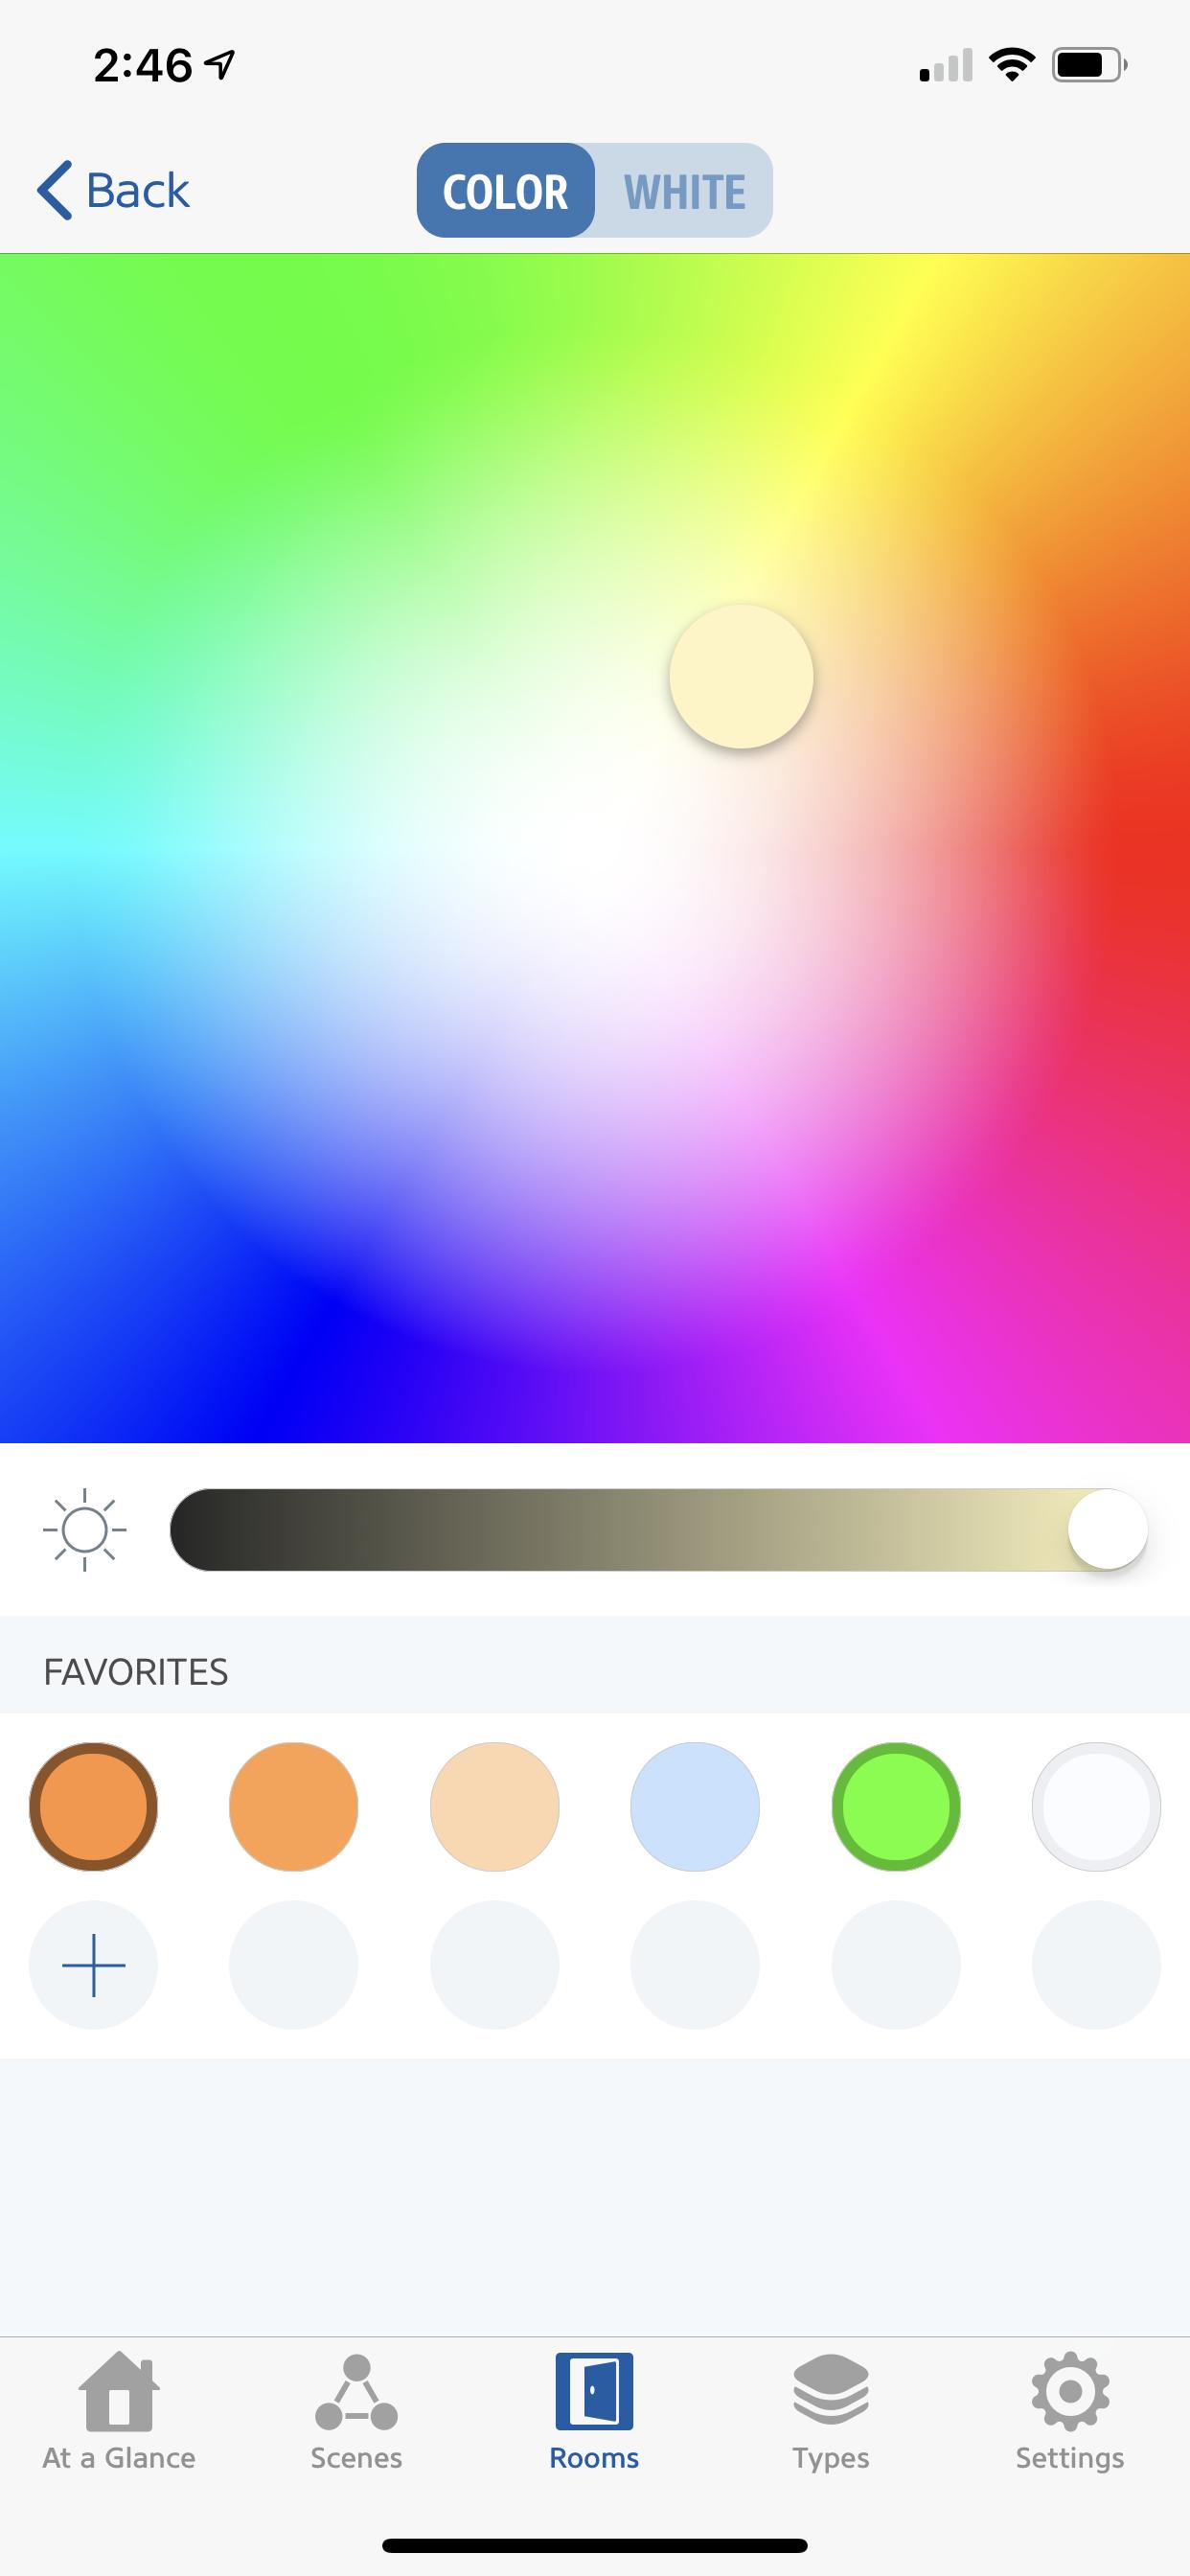 Color light settings